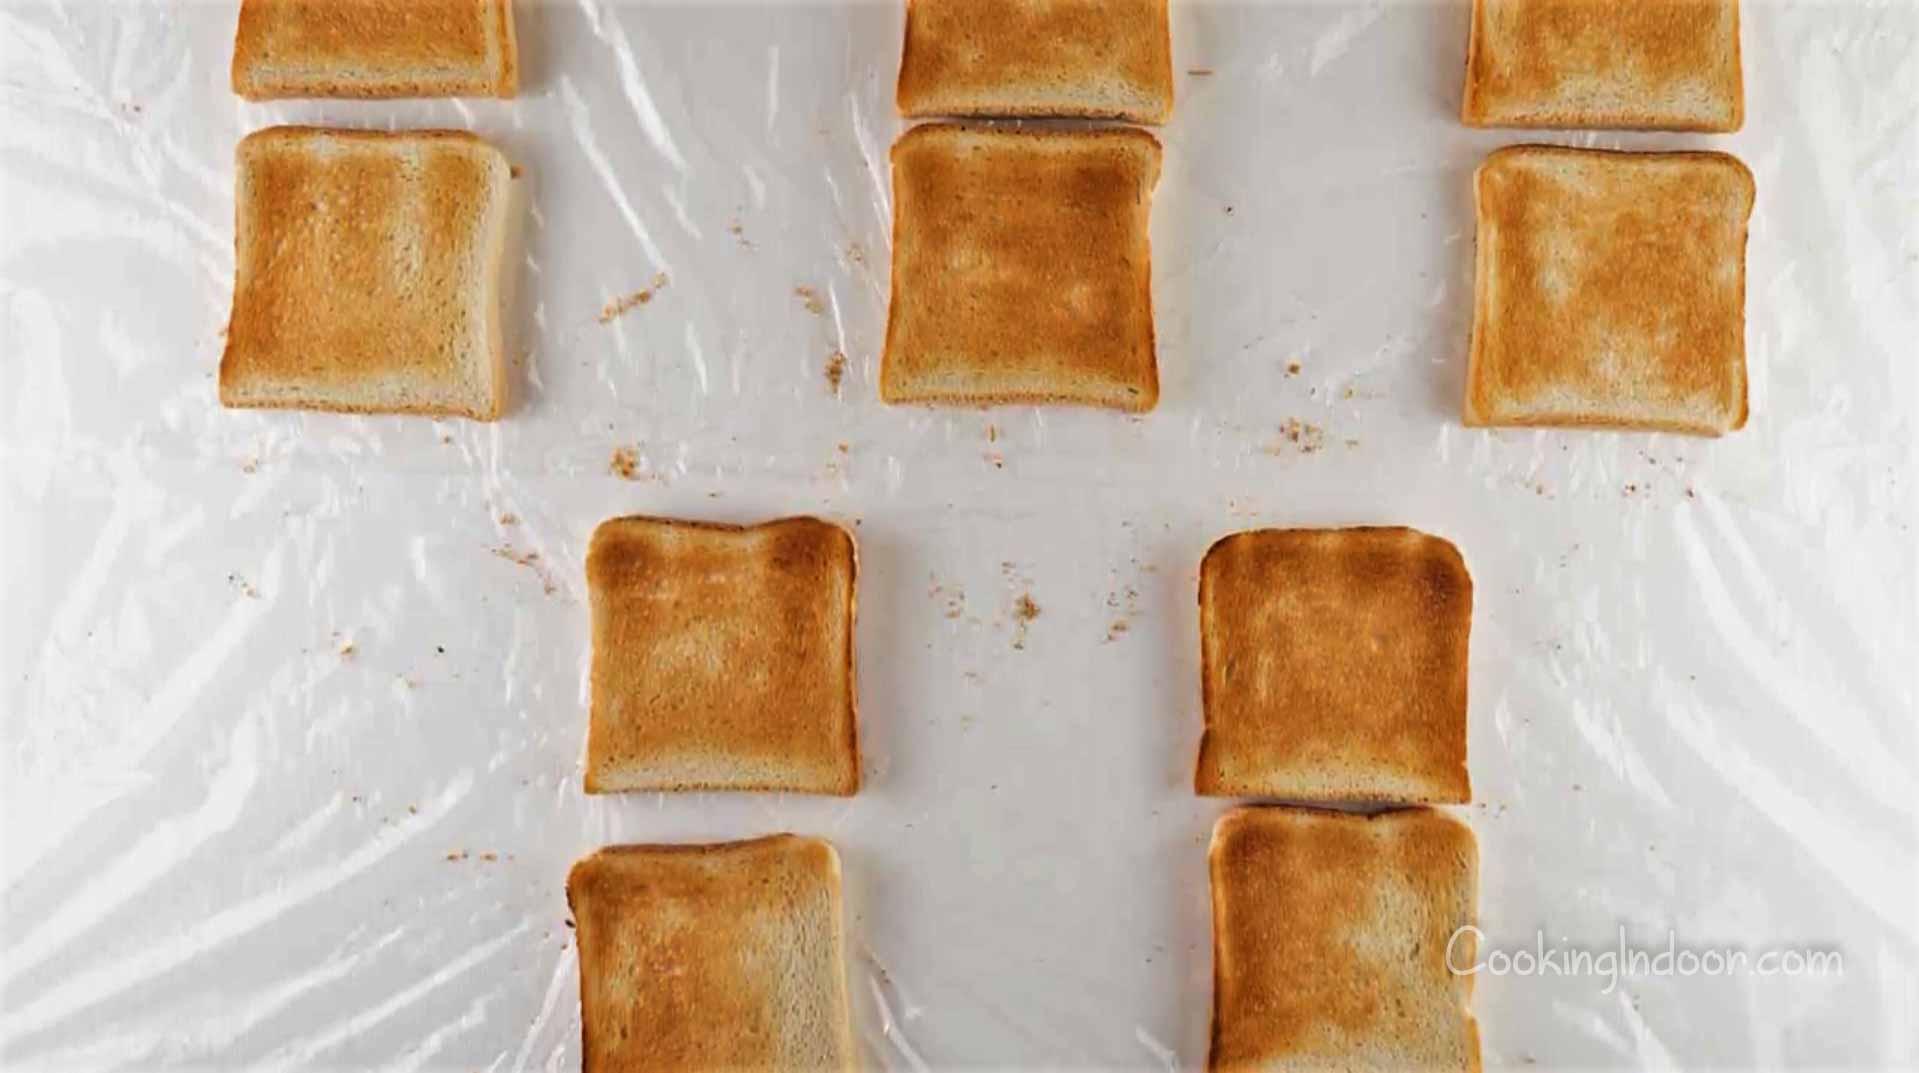 Best Kalorik toaster